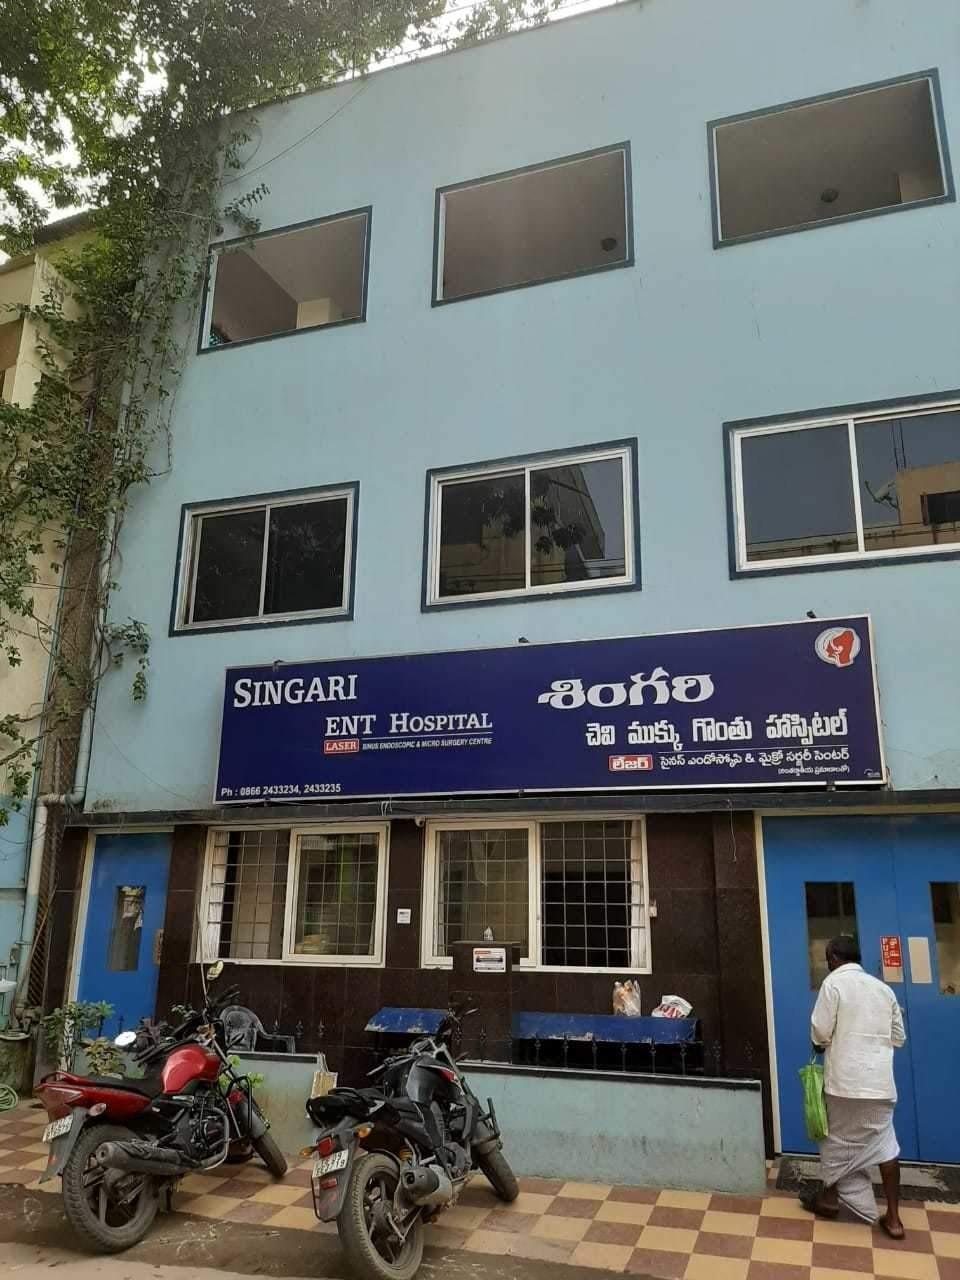 Singari ENT hospital